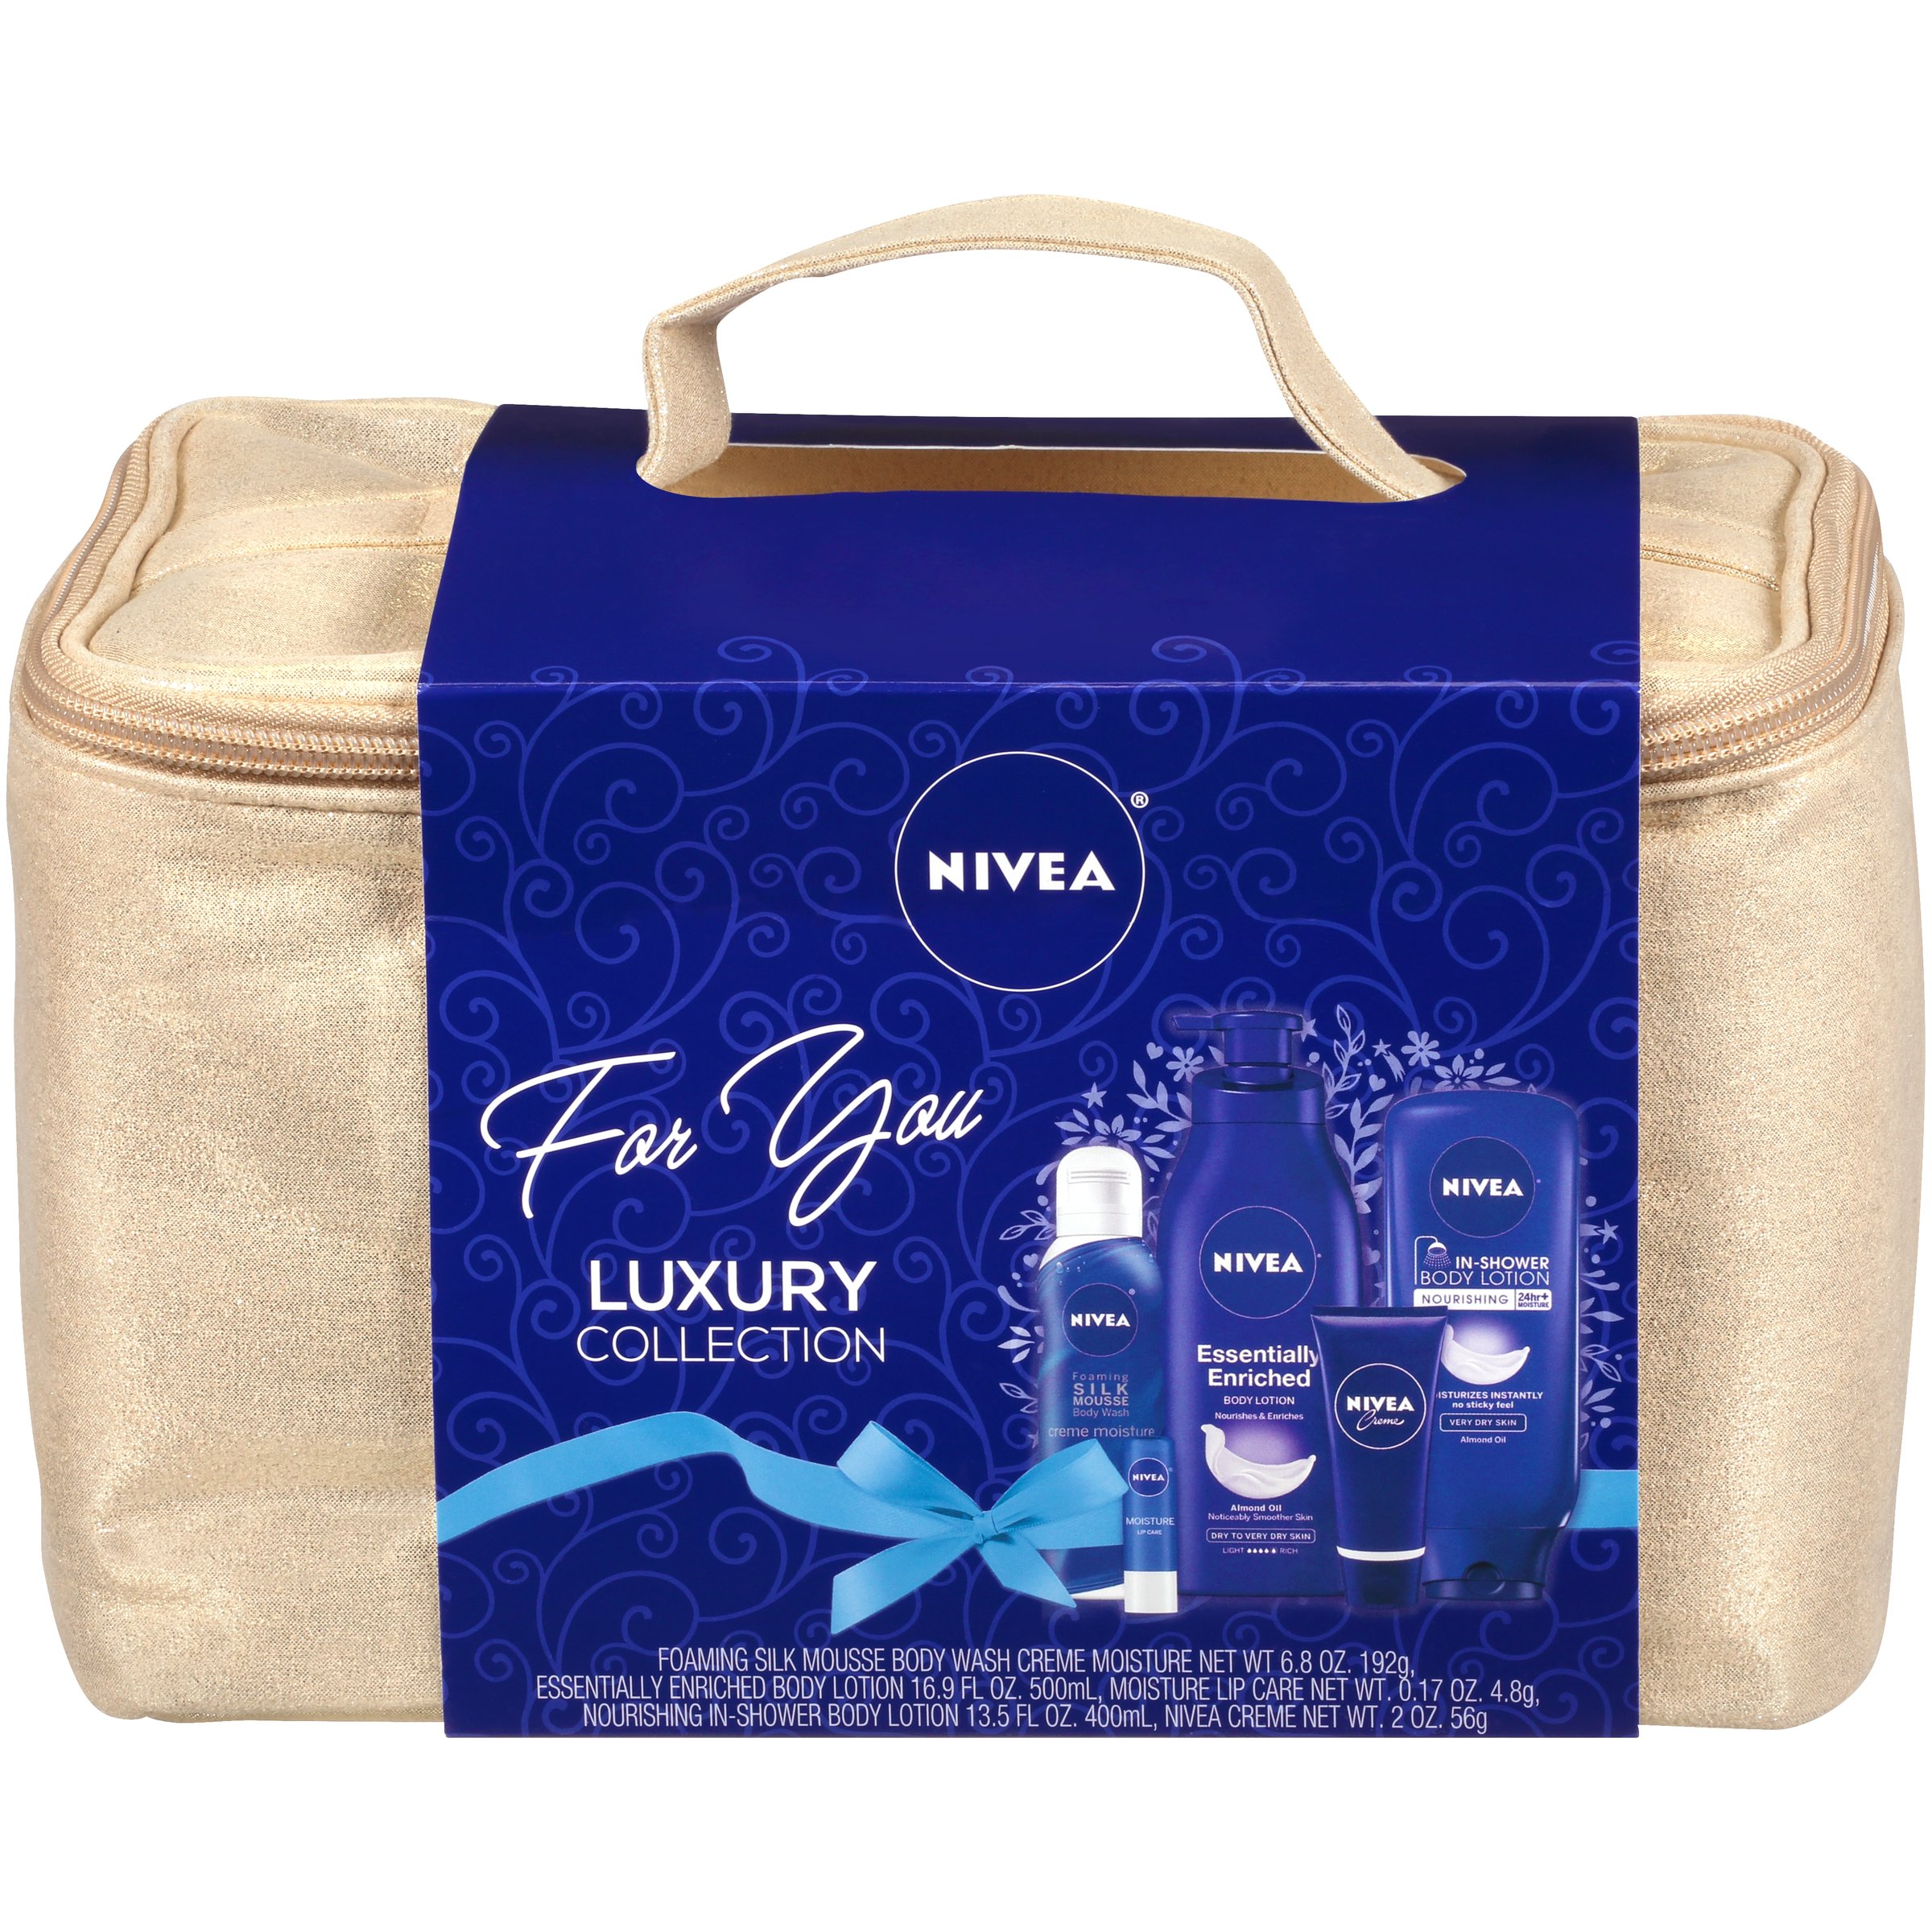 Nivea Luxury Collection 5 Piece Gift Set by Nivea (Image #1)